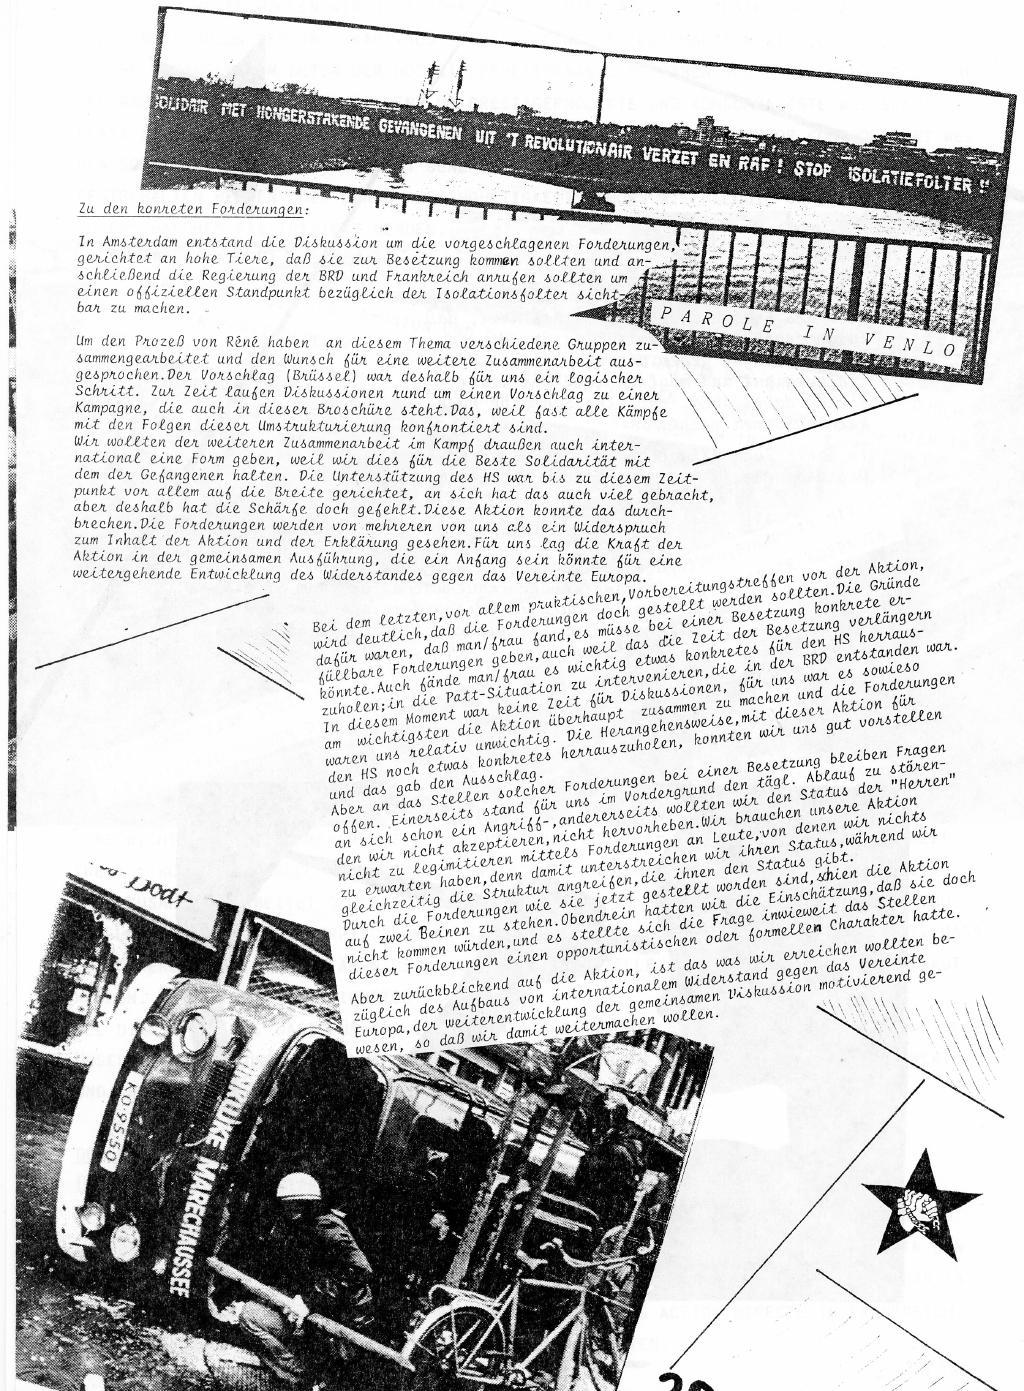 Belgien_Doku_Besetzung_EG_Kommission_1989_032